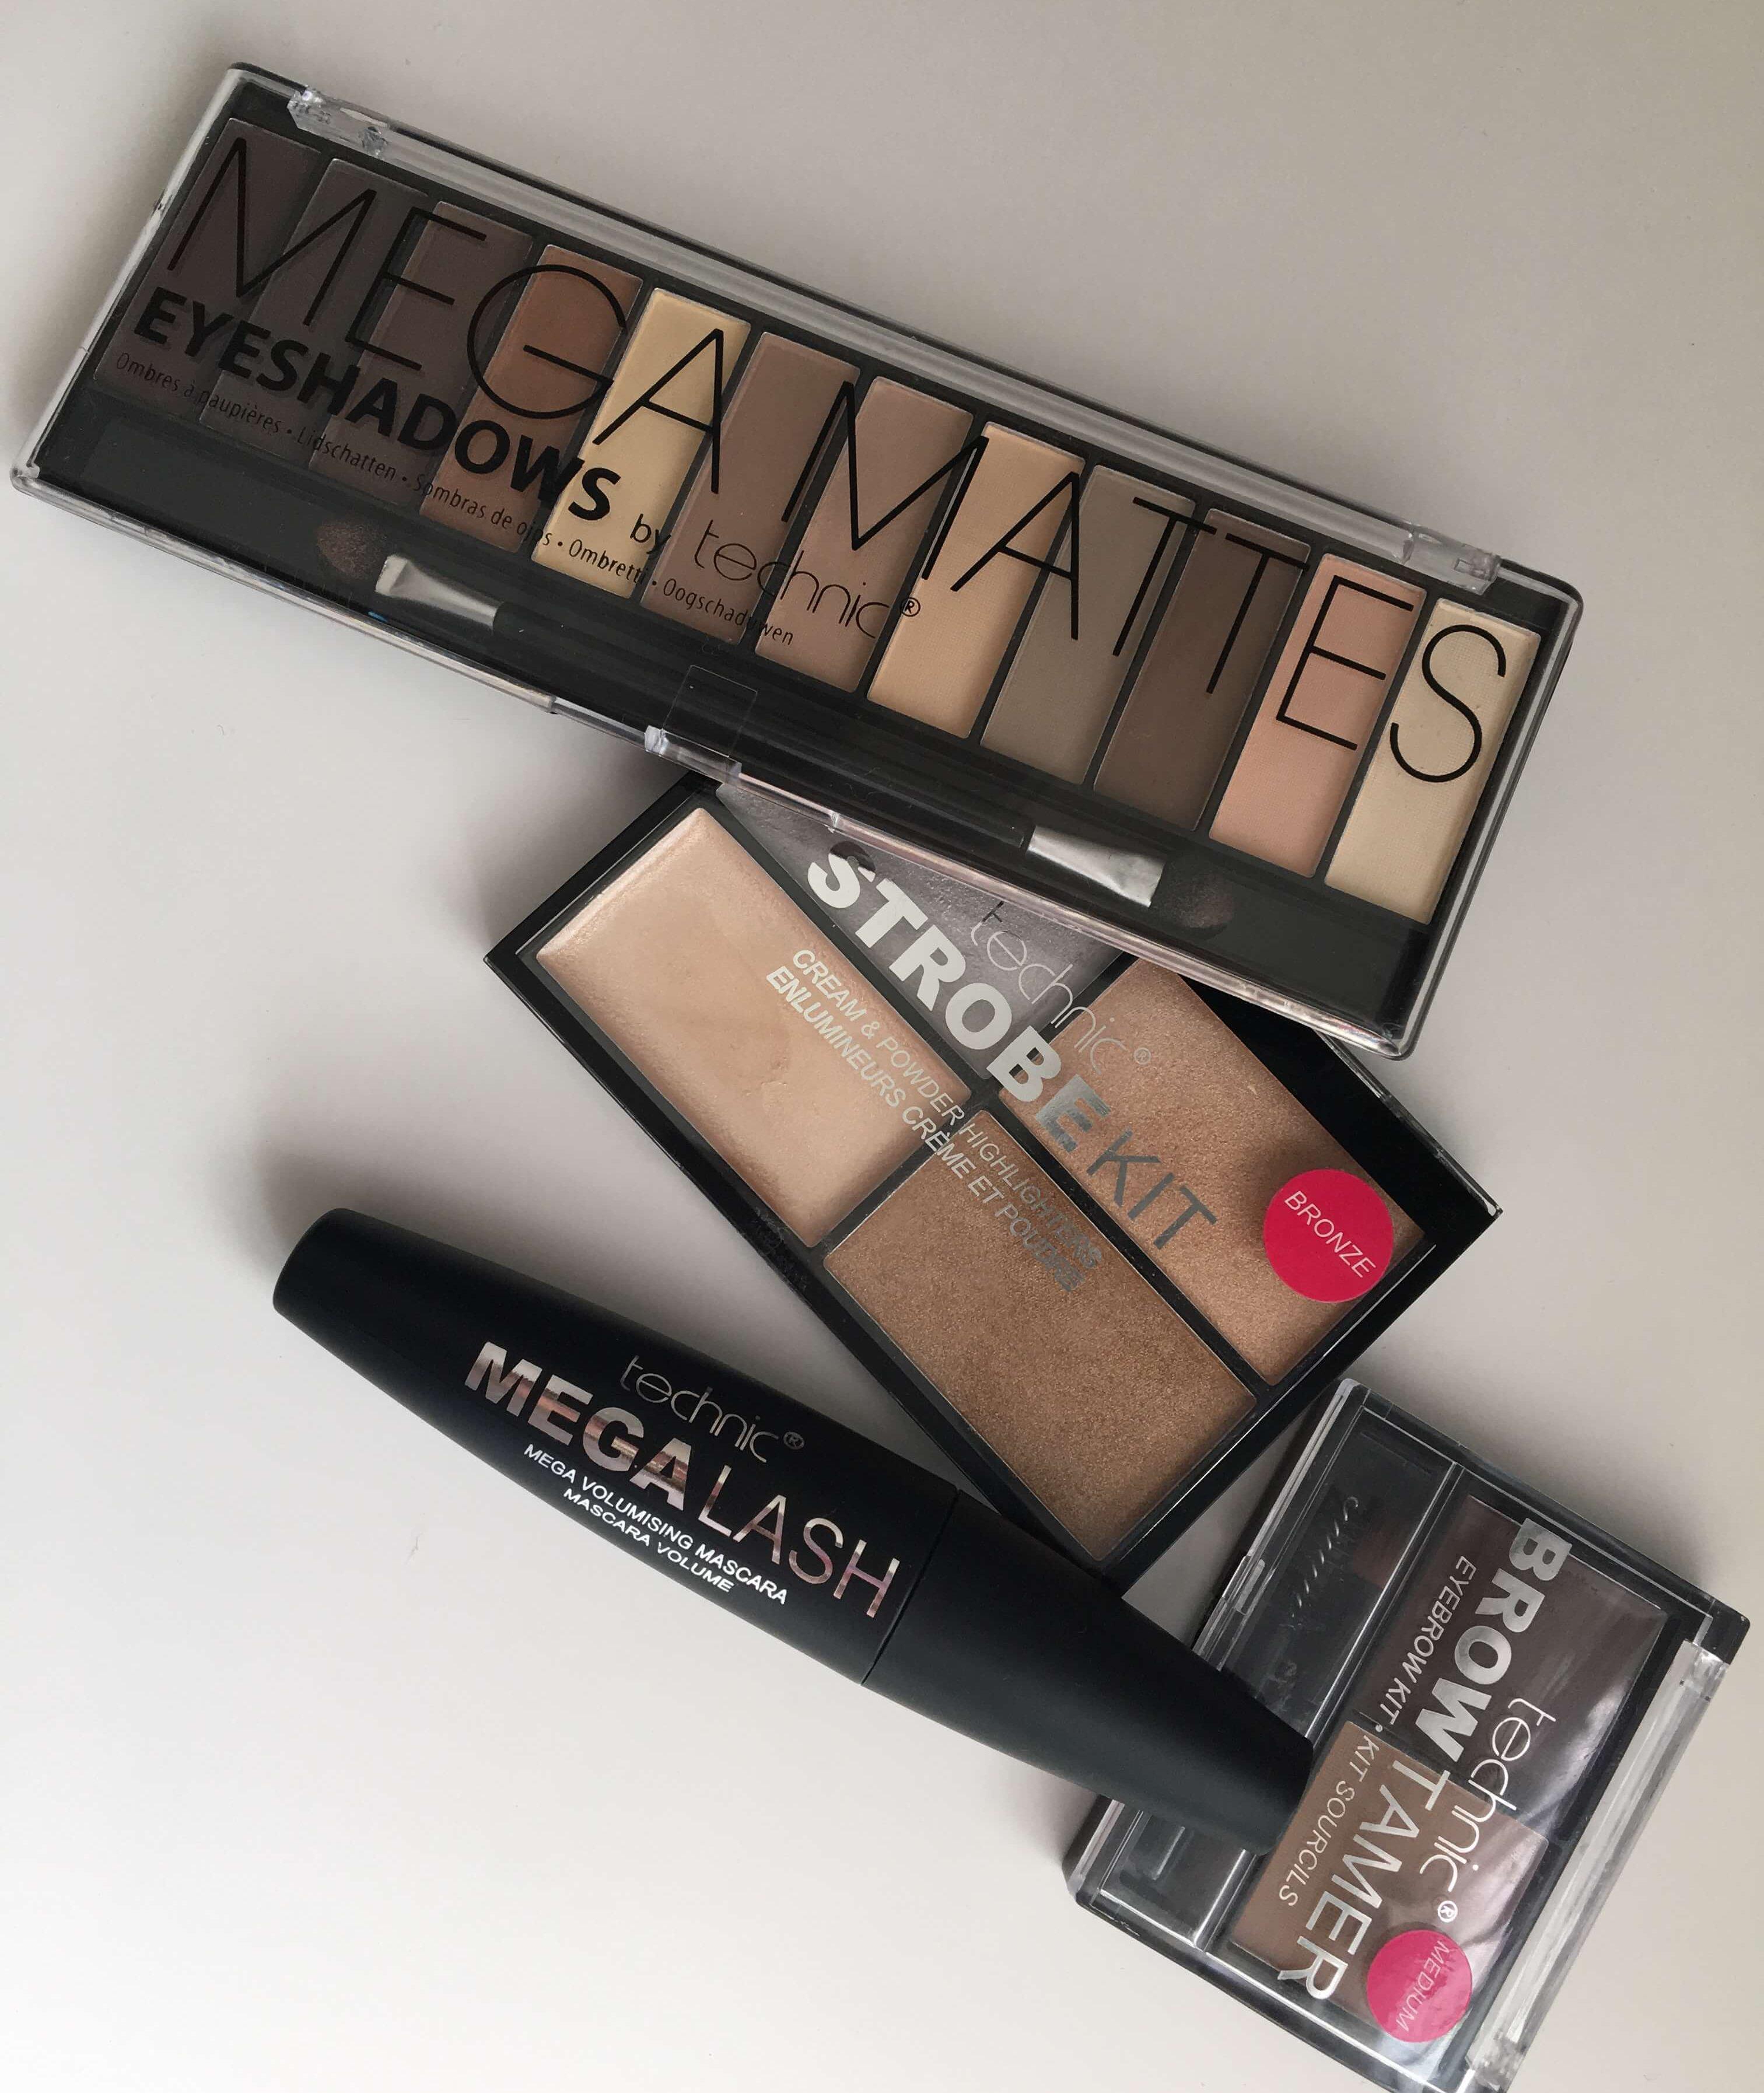 Technic Die Neue Marke Bei Bema Teil2 Bema Beauty Products